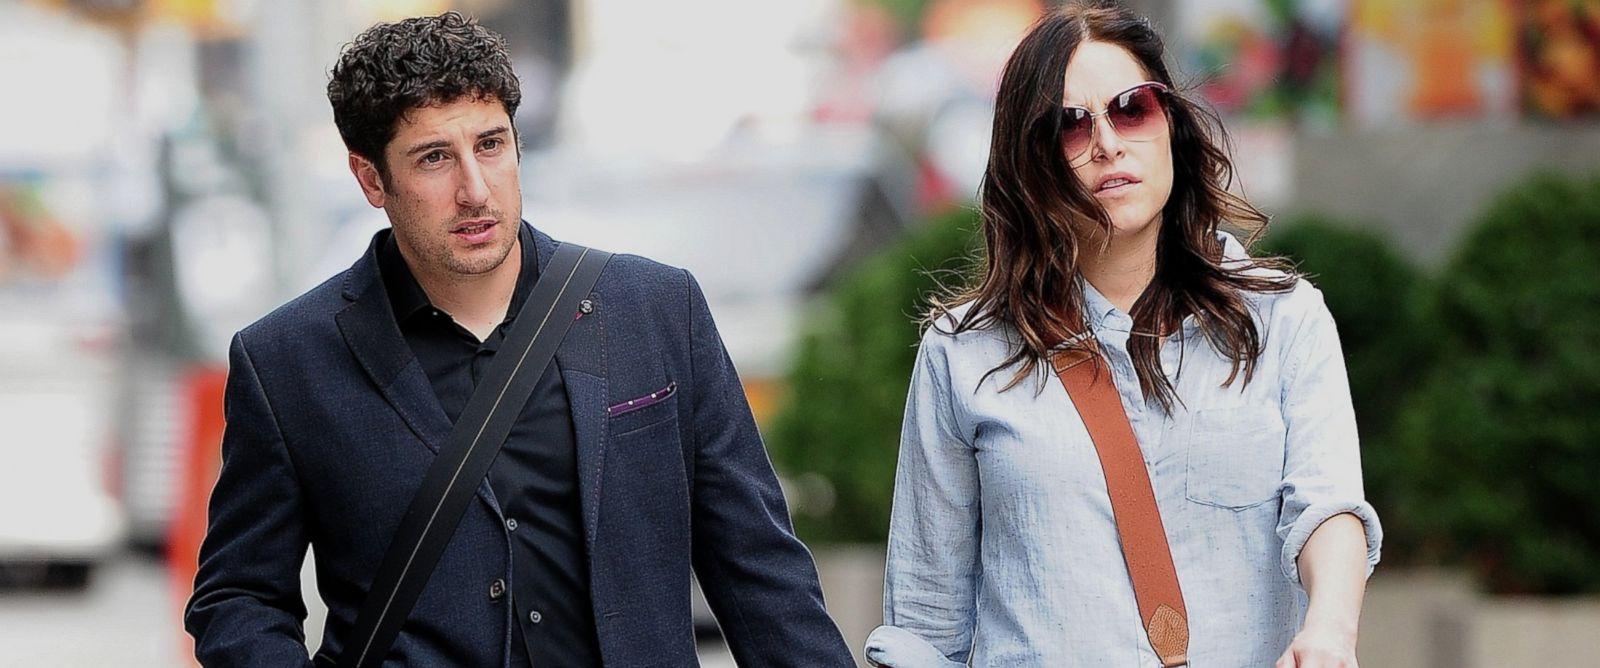 PHOTO: Jason Biggs and Jenny Mollen walk in Soho, Oct. 3, 2013 in New York.